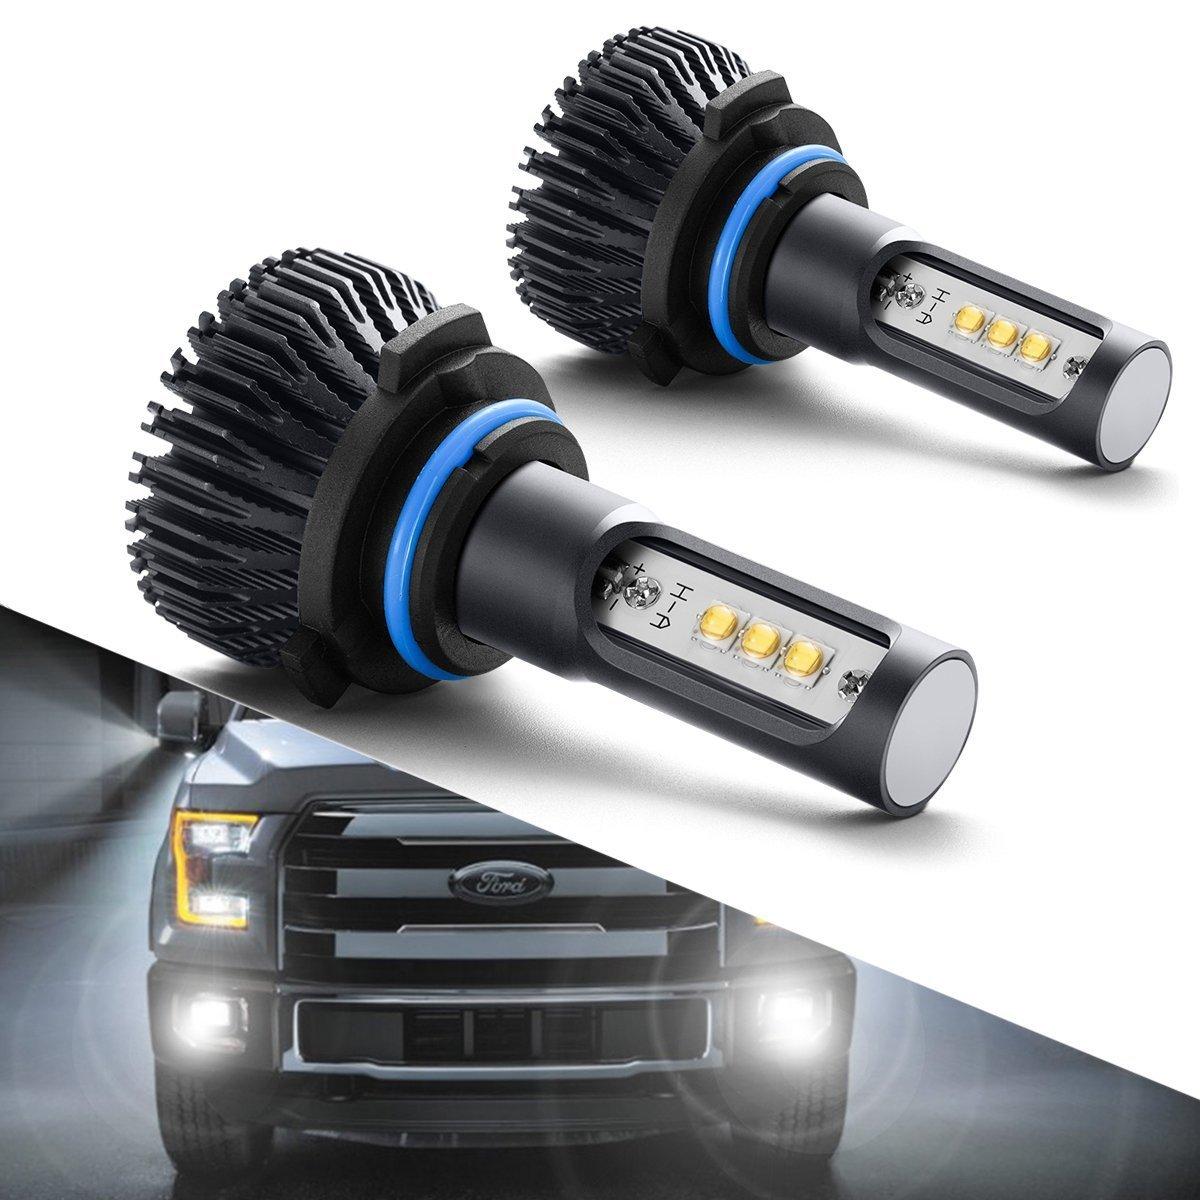 H11/H16/H8 LED Fog Lights Bulbs or DRL, DOT Approved, SEALIGHT Xenon White 6000K, 12 x CREE LED Chips